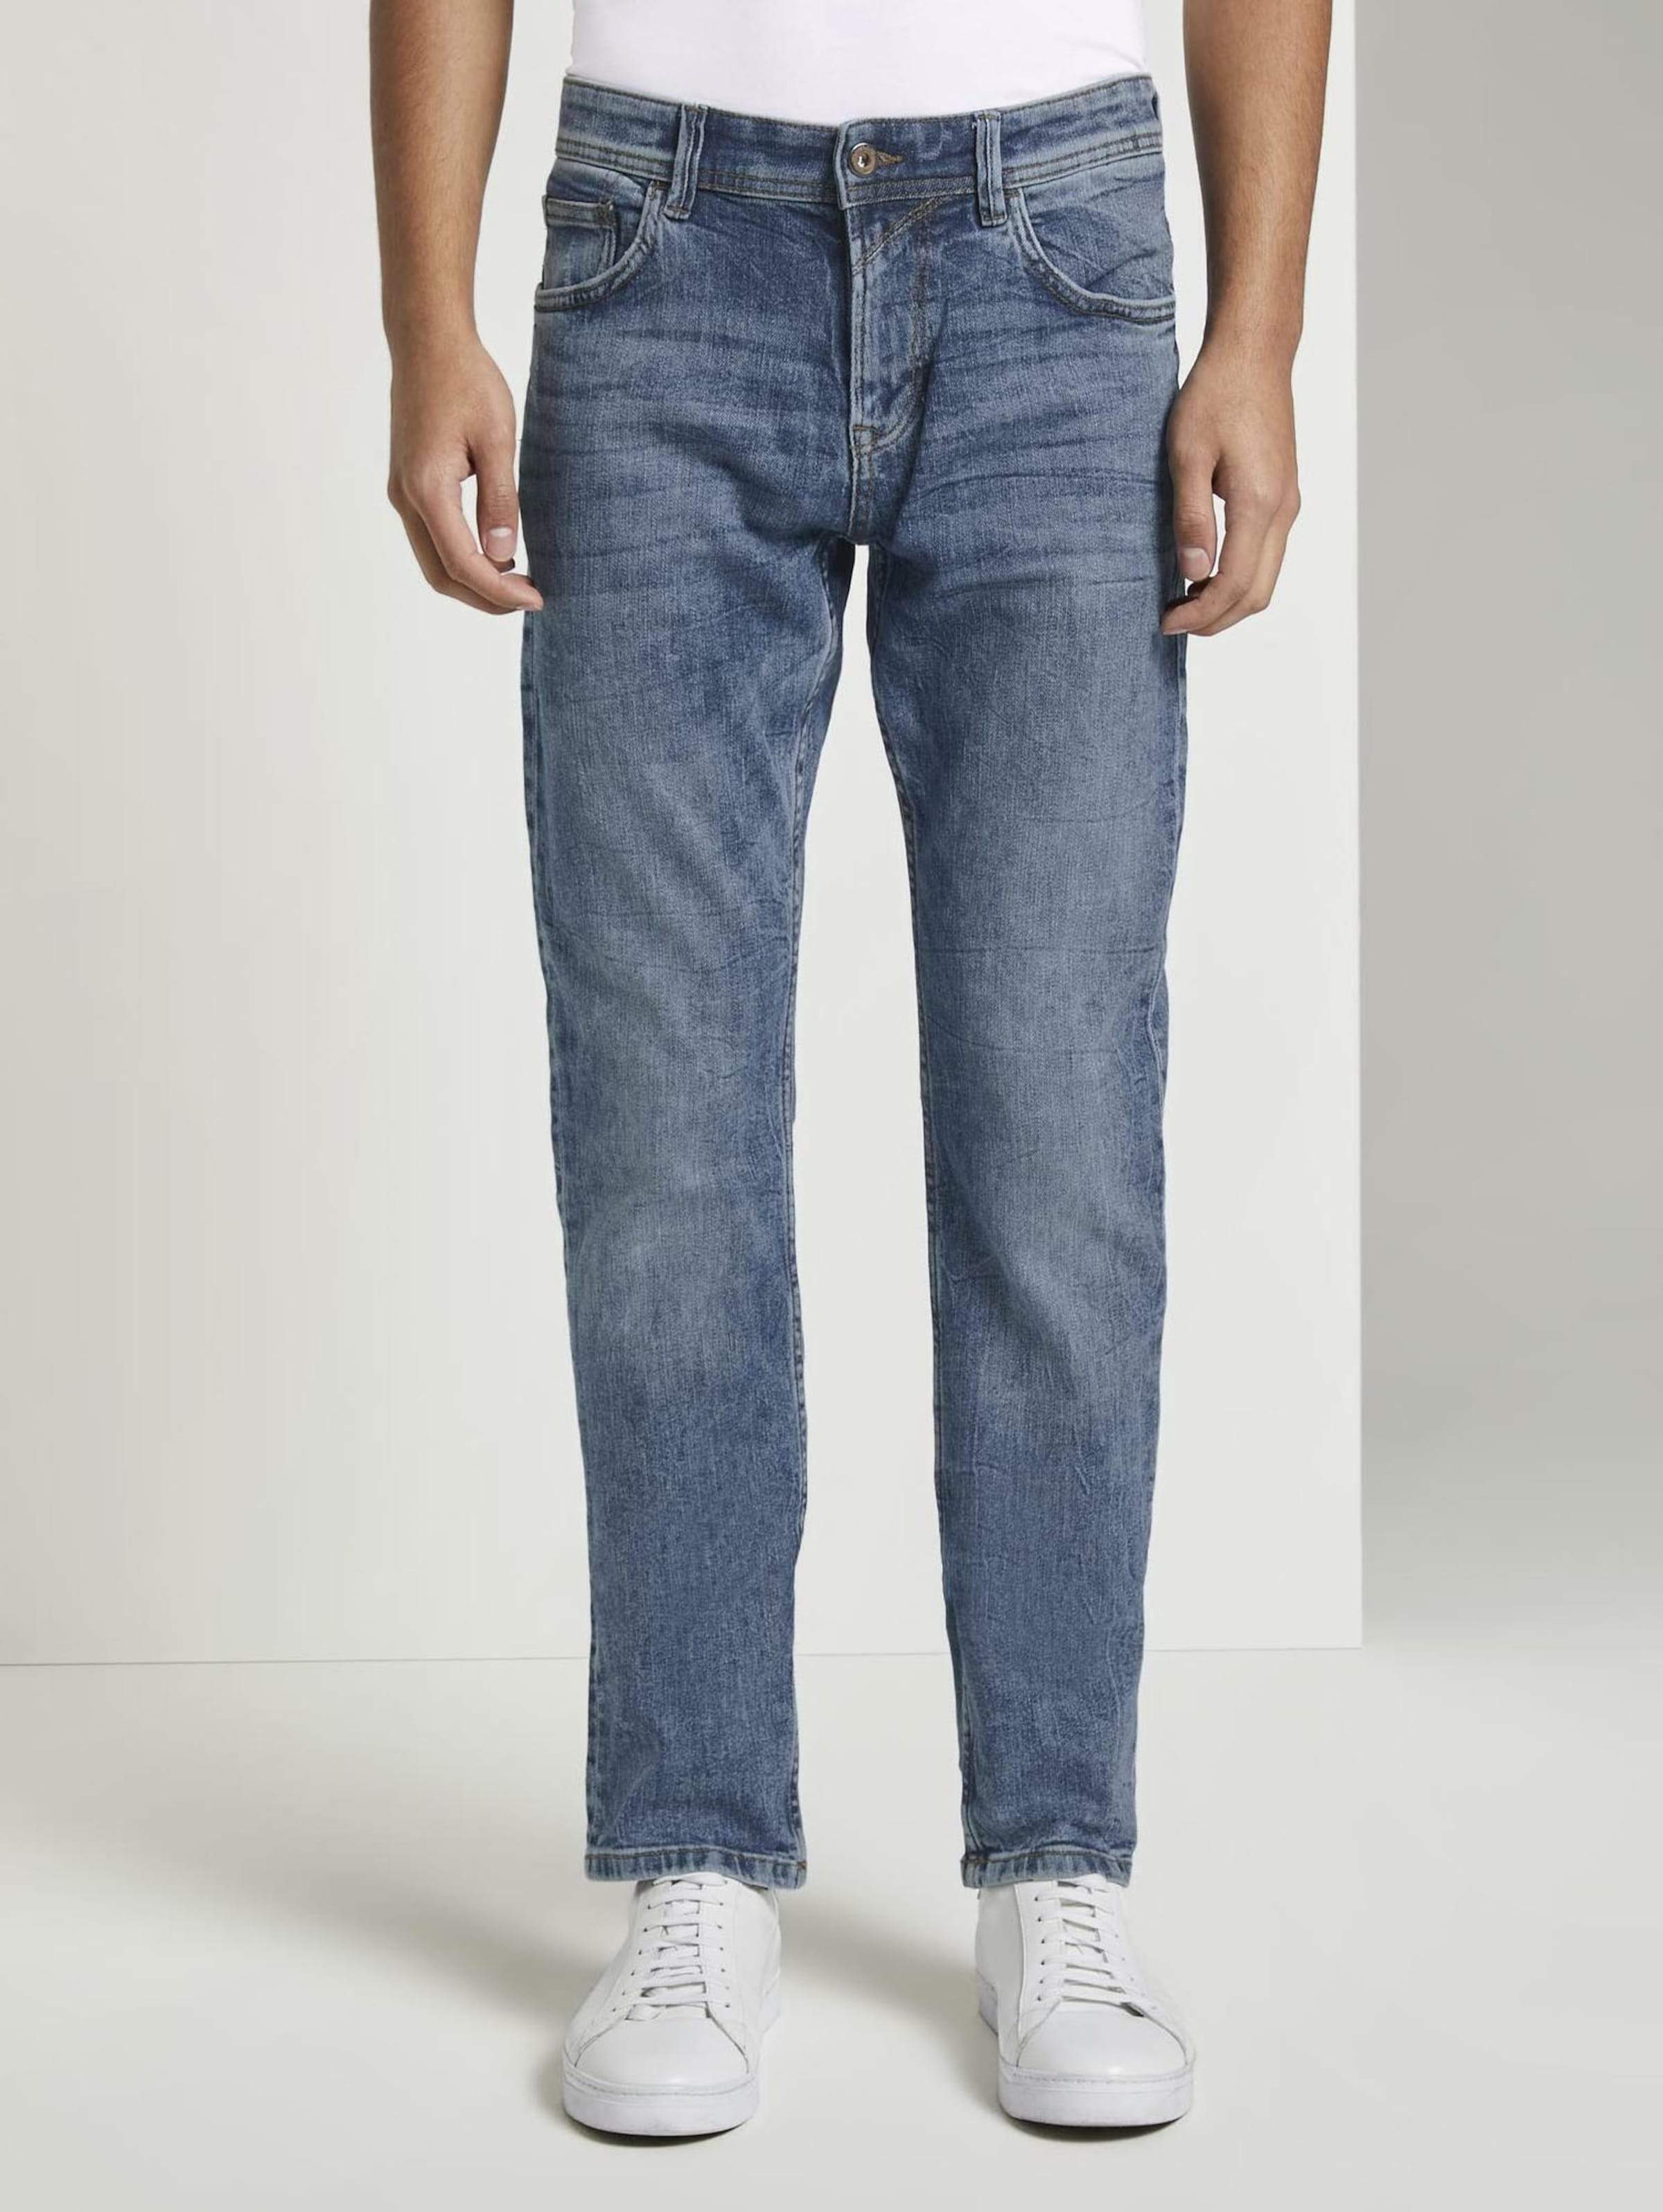 TOM TAILOR DENIM Jeans in blue denim Jeans 1016275015